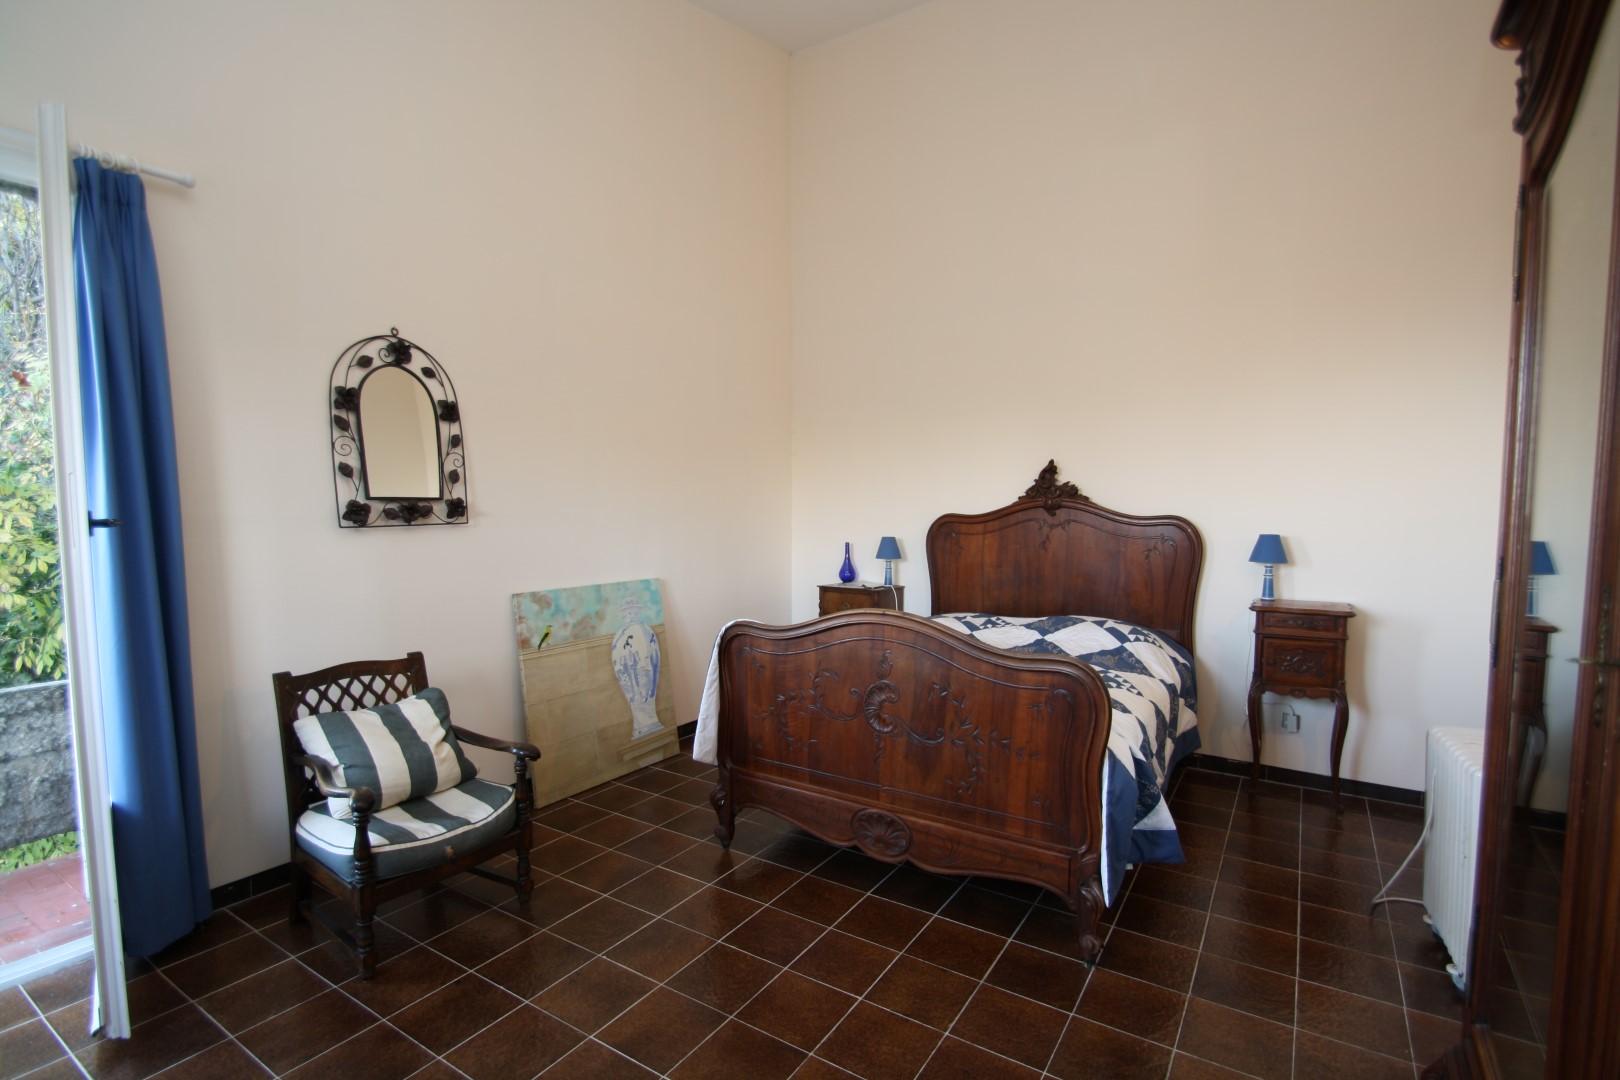 img 2119 large agence immobili re bastia avec localisimmo agence immobili re bastia avec. Black Bedroom Furniture Sets. Home Design Ideas